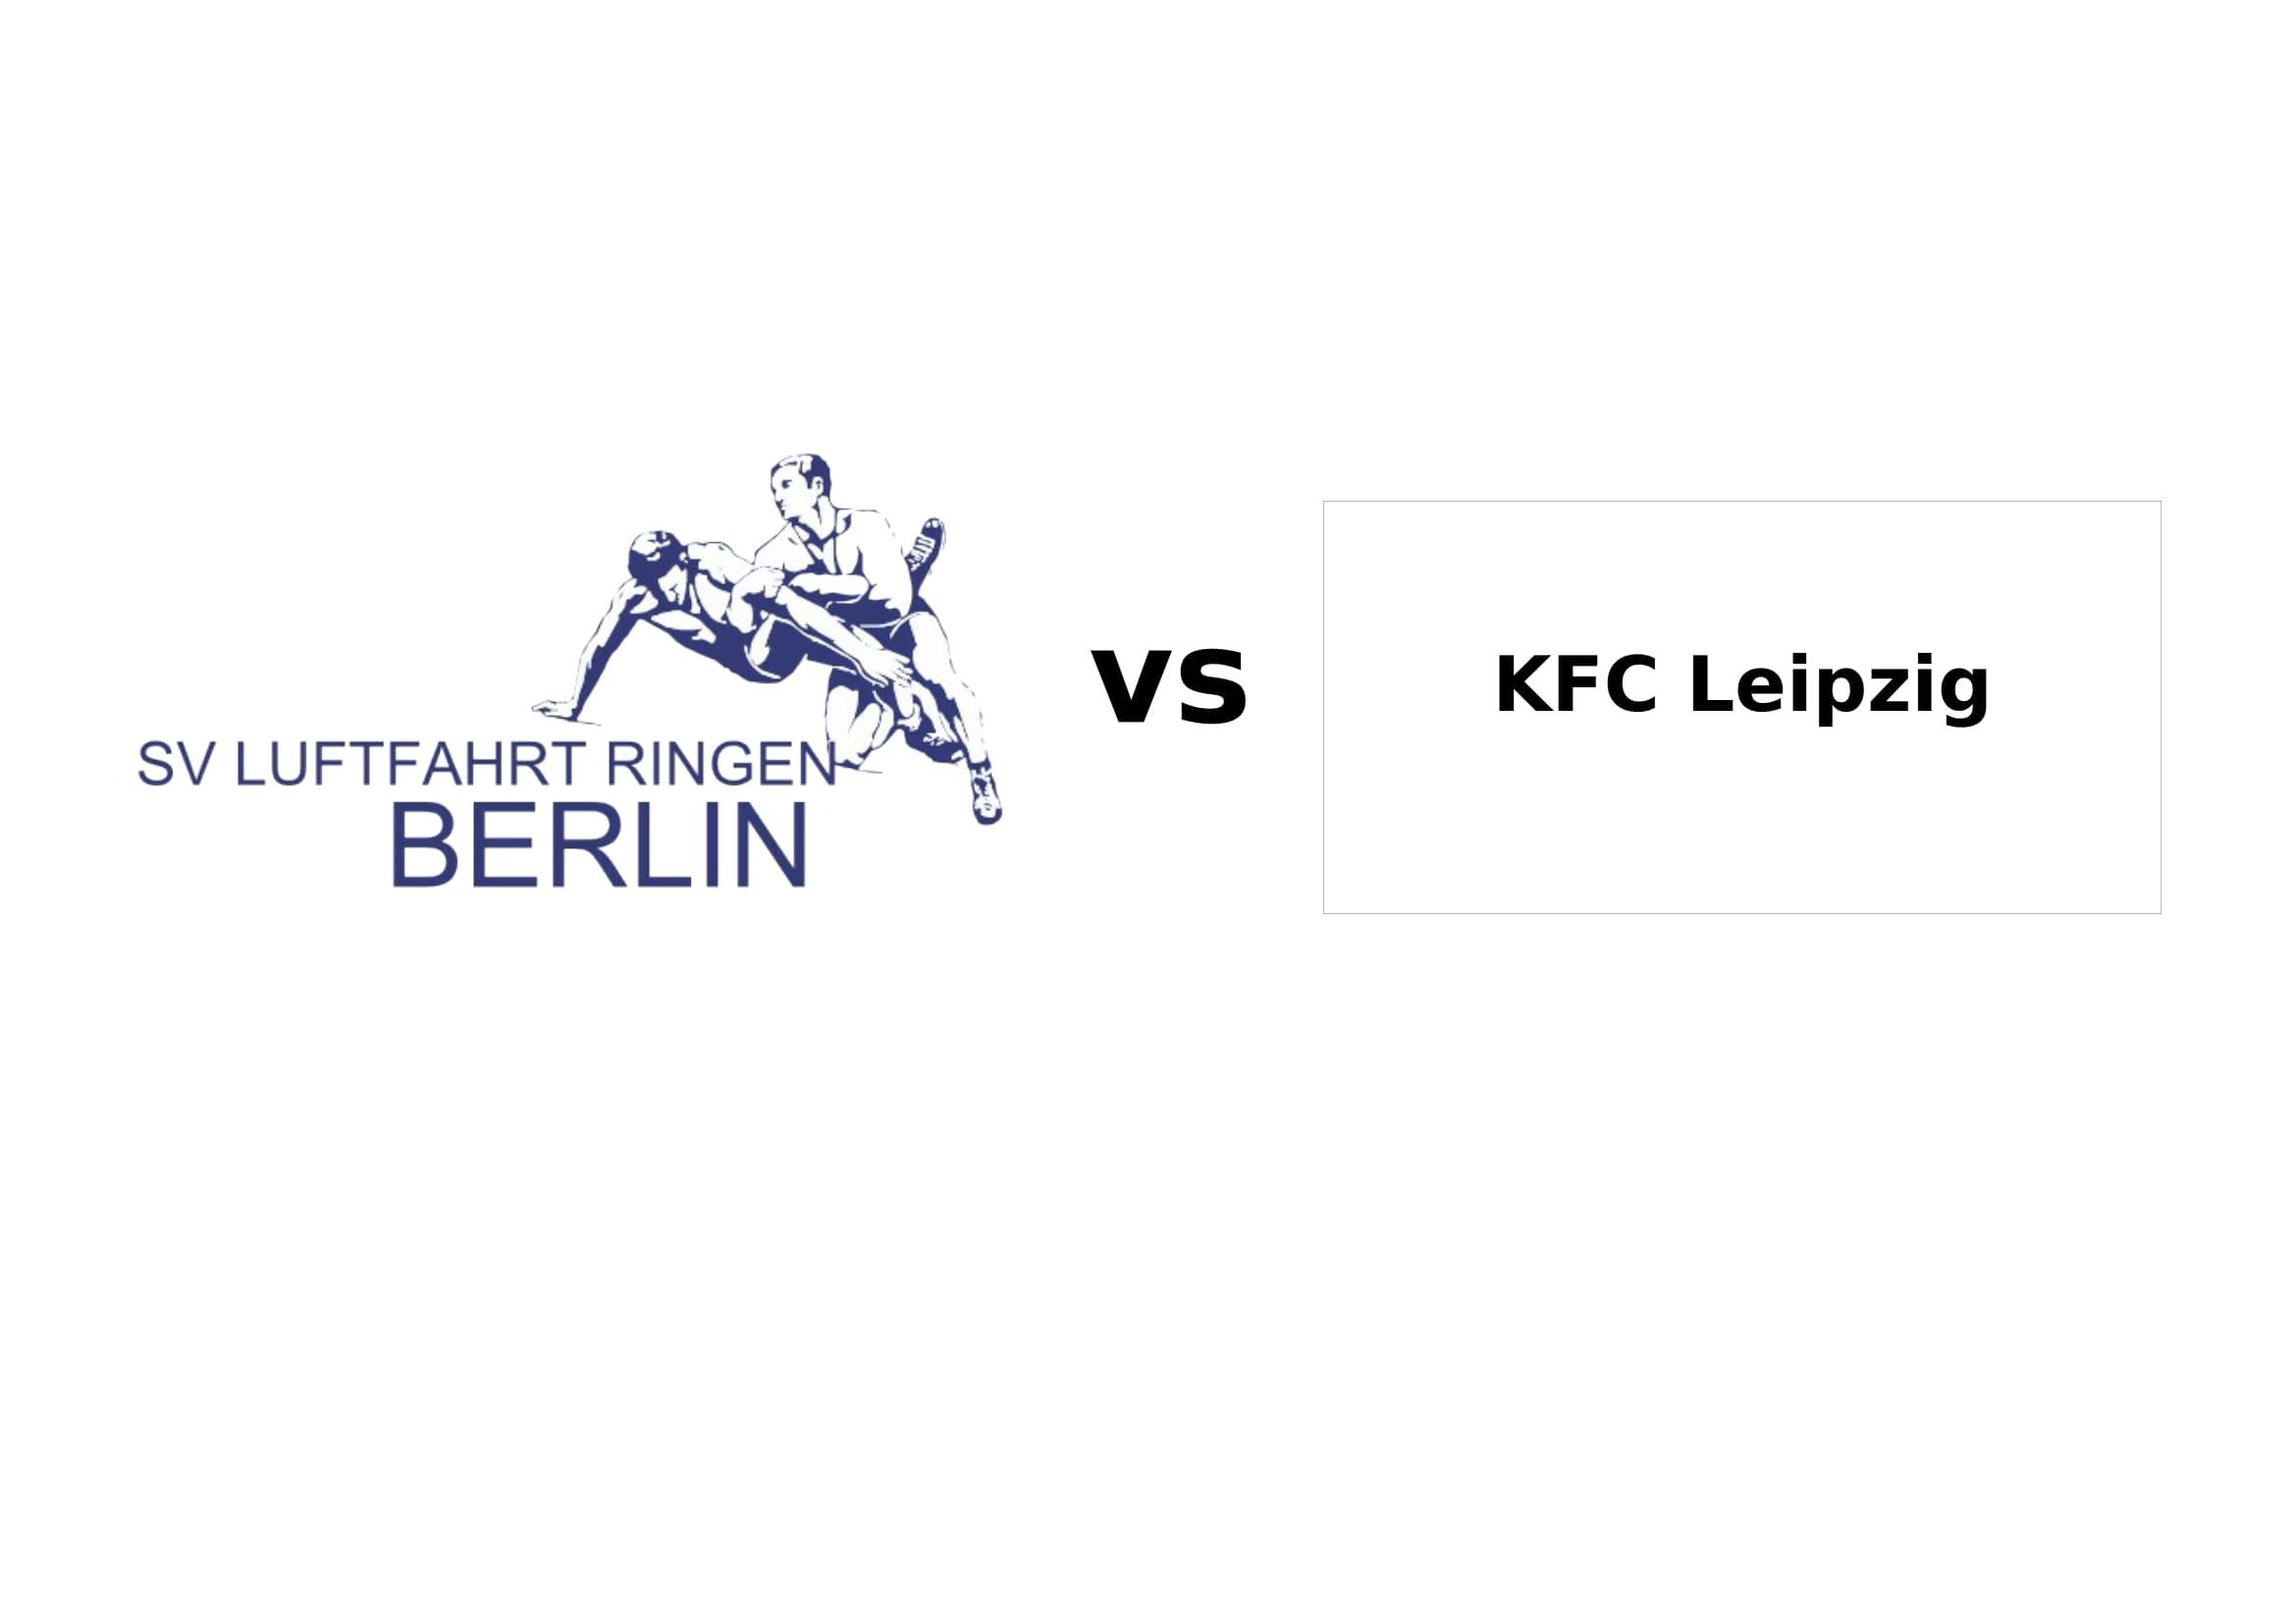 RL-Heimkampf SVL vs. KFC Leipzig